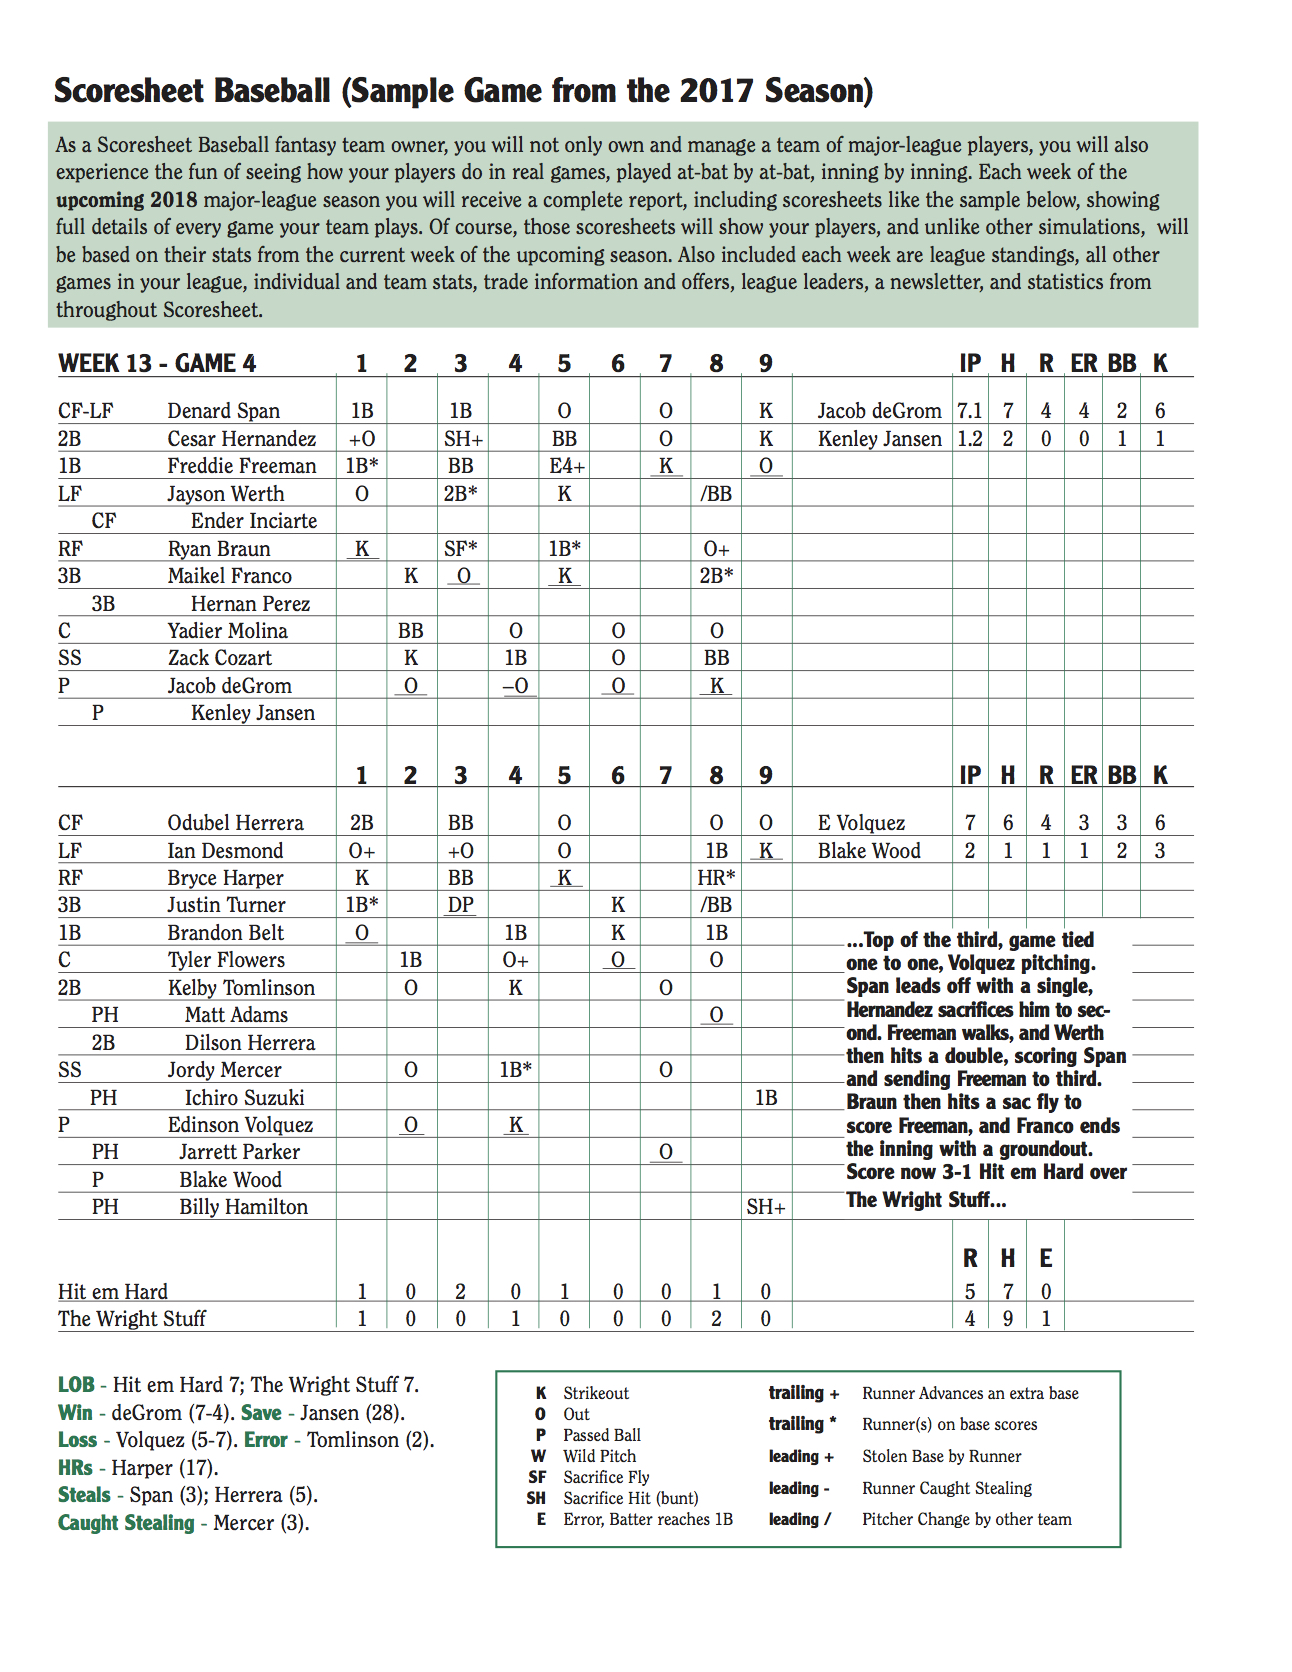 Scoresheet Fantasy Baseball